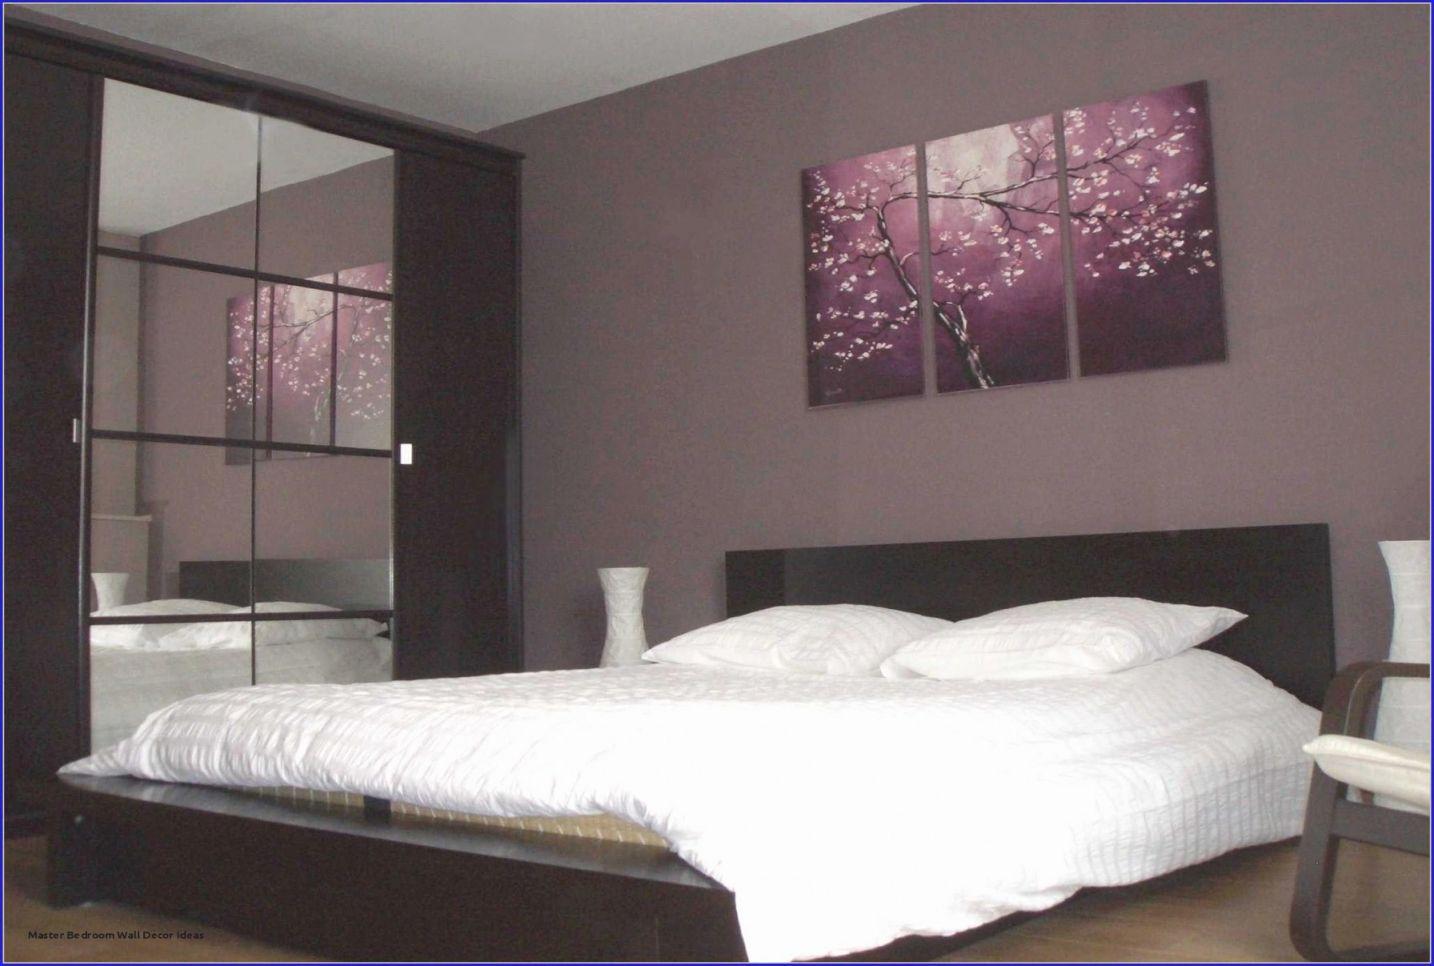 Bedroom Ideas : Diy Wall Decor Art Artistic Decorating Boho inside Wall Decoration Ideas For Bedrooms